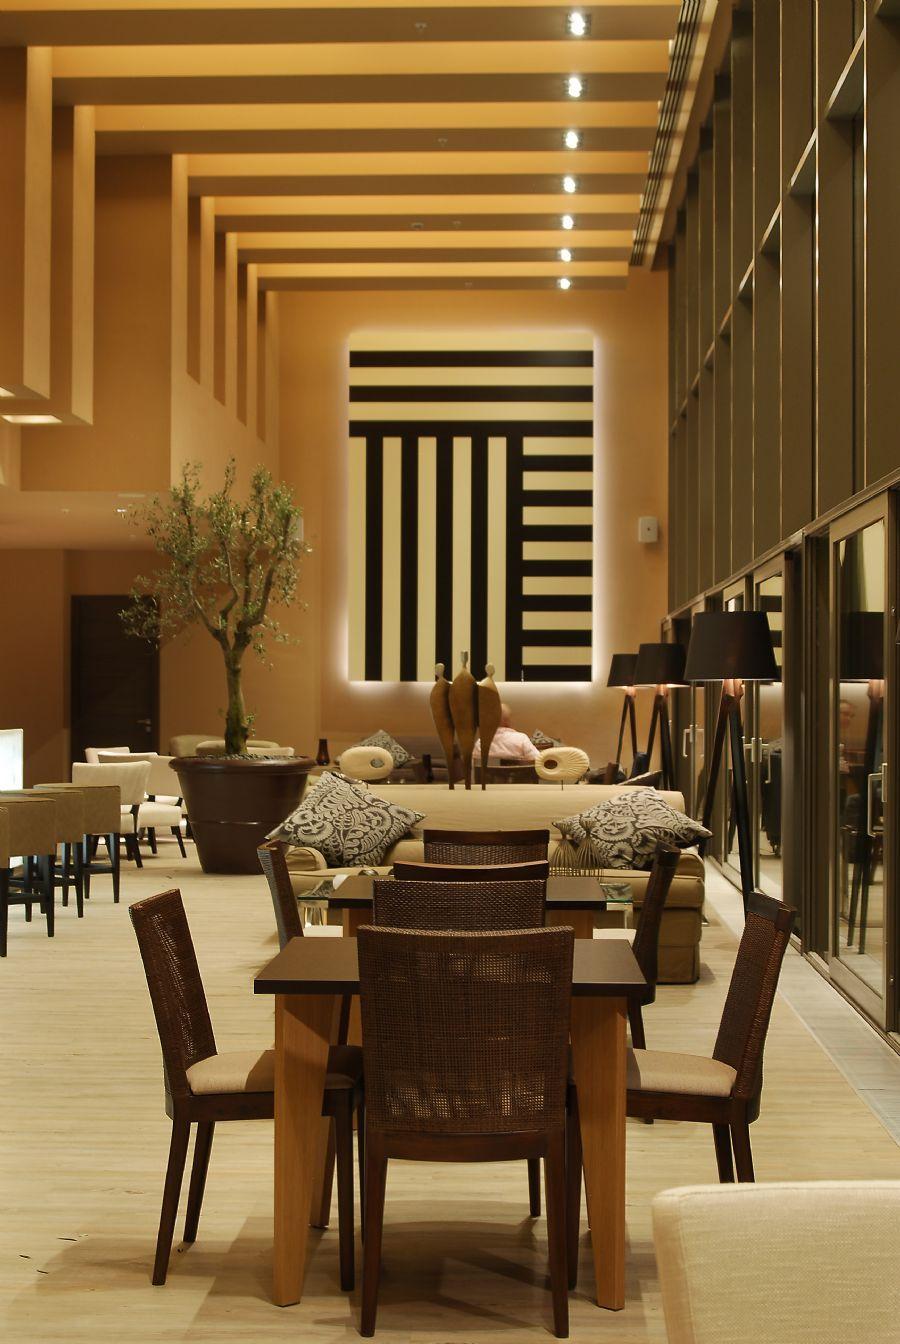 L'Ist Istinye, Recreation Center, Istanbul, Pool, Bar, Lounge, Toner Mimarlik, Architects, Interior Design, Architecture